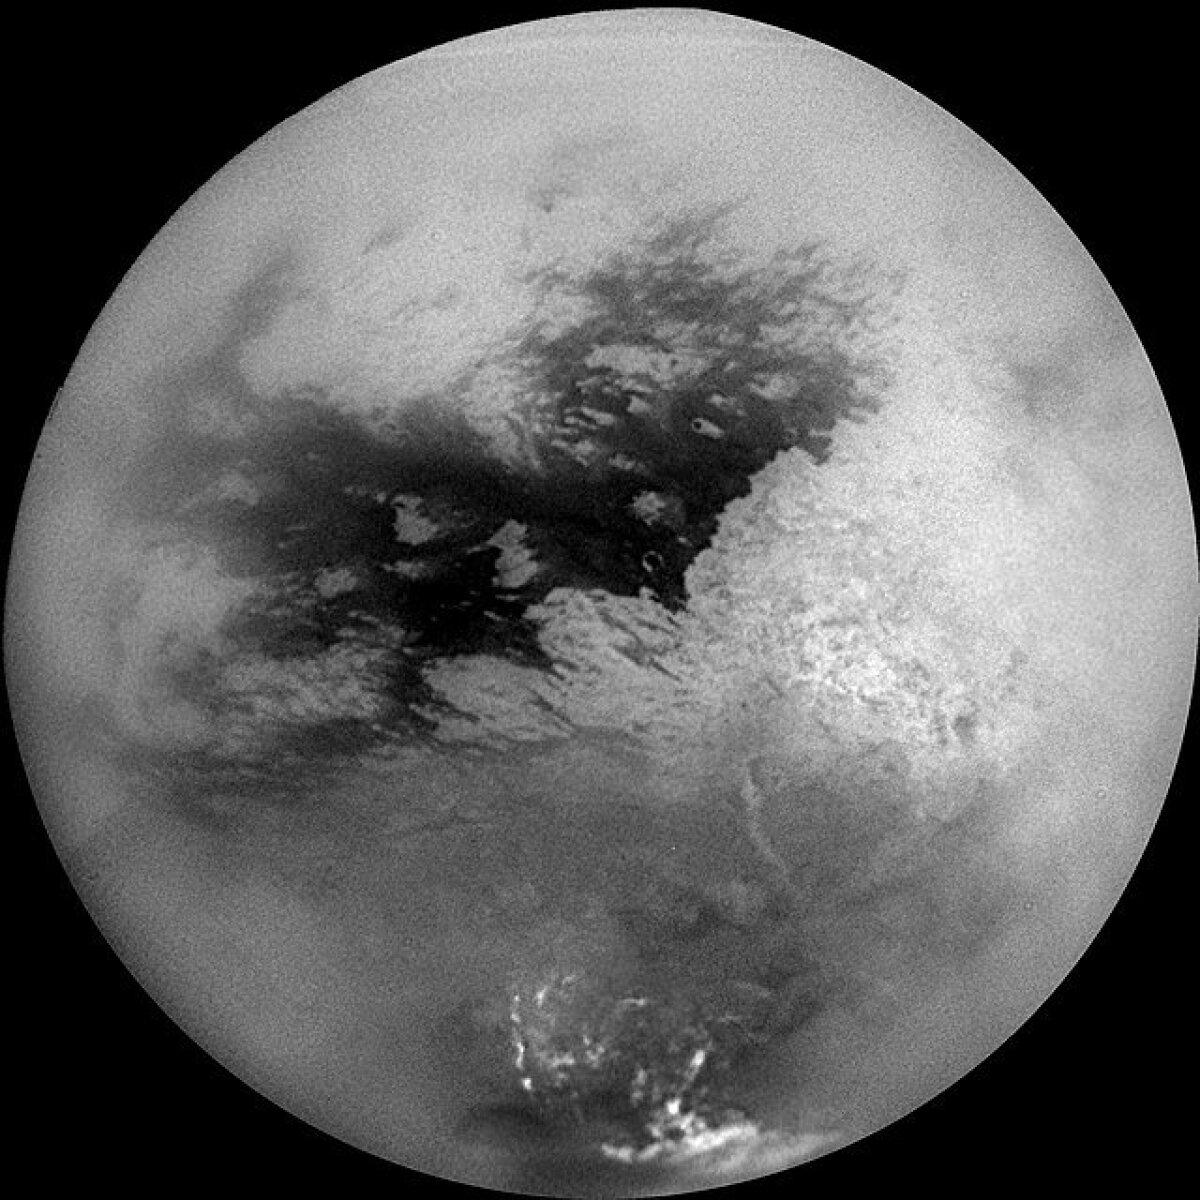 Üheksast fotost koosnev mosaiik Titanist, pildistatuna kosmoseaparaadi Cassini pardalt 2004. a (foto: NASA, JPL, Space Science Institute / CC BY-SA 4.0 / Wikimedia Commons)